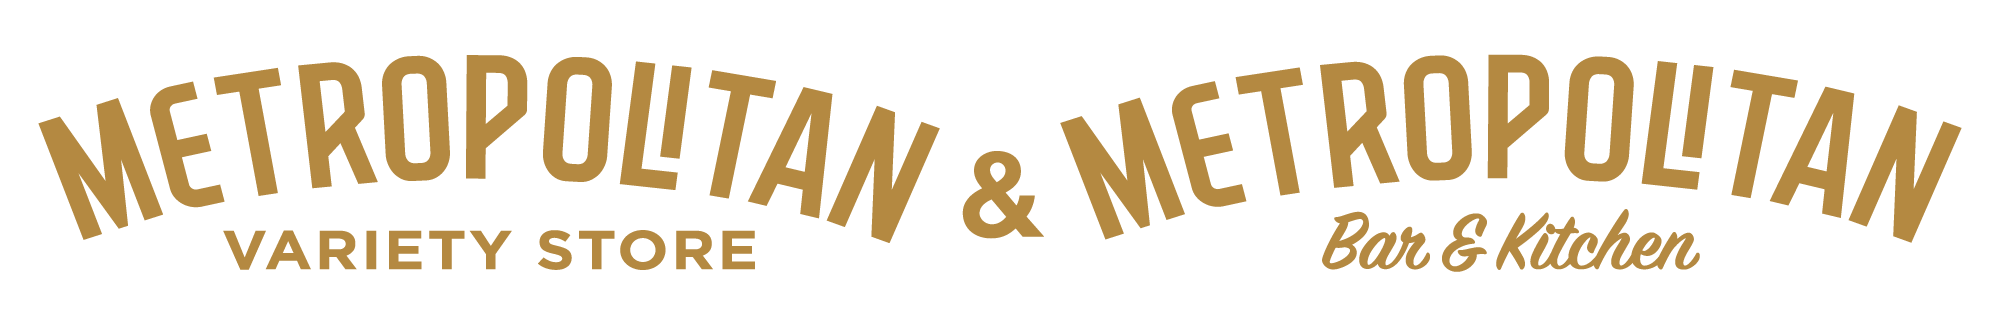 Metropolitan Variety Store